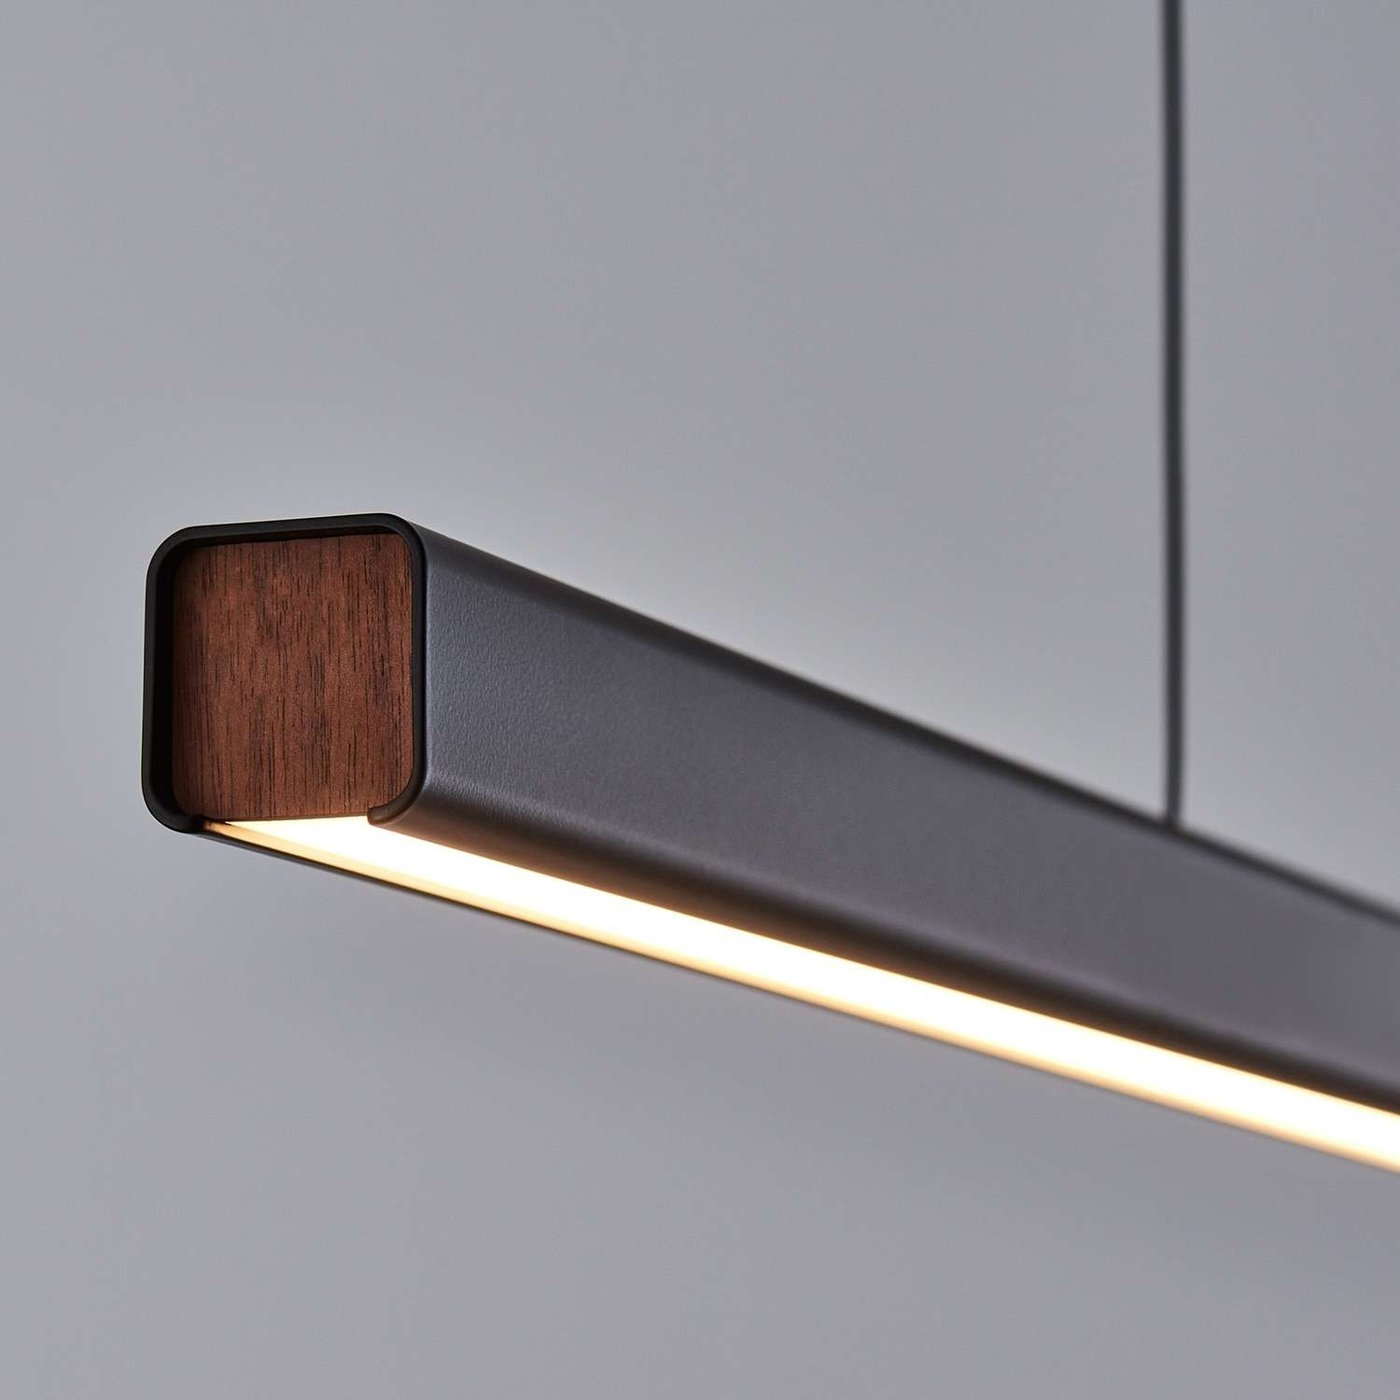 Seed Design Mumu LED Linear Suspension